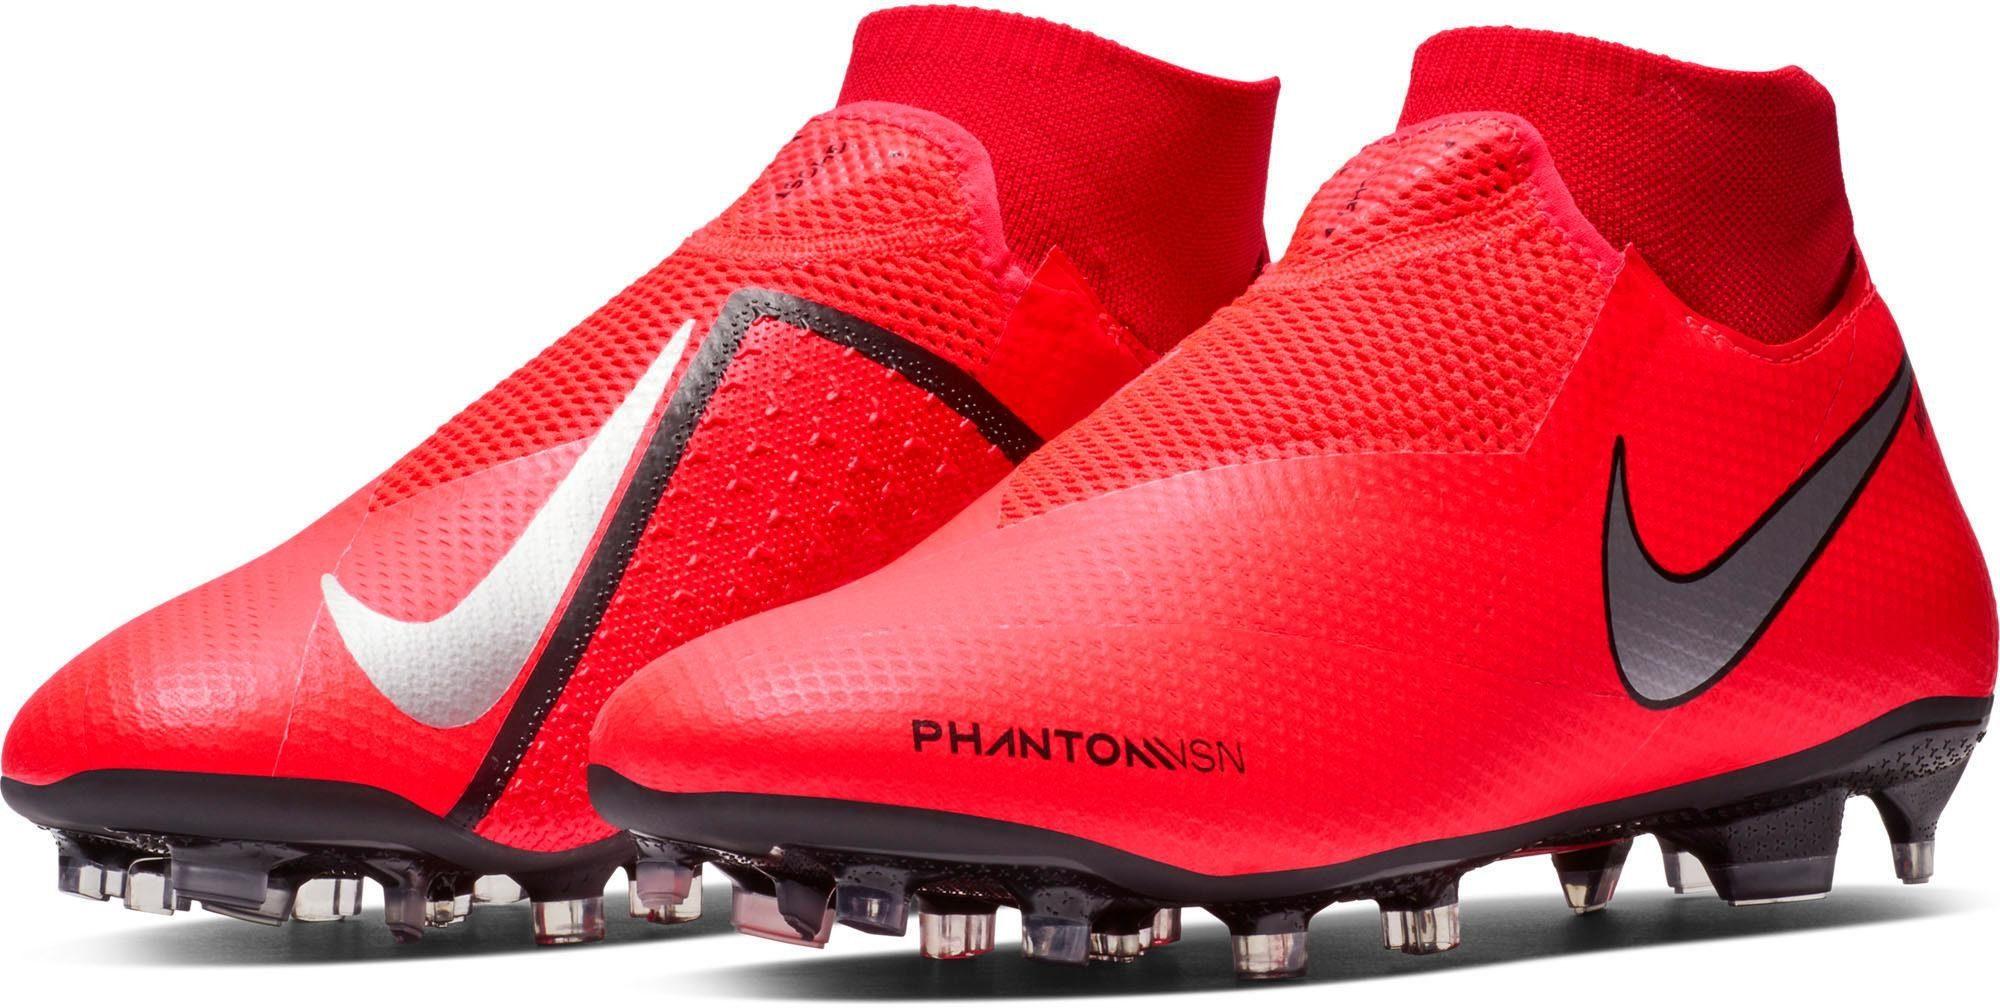 Nike »Phantom Vision Pro Dynamic Fit (FG) Firm-Ground« Fußballschuh  Rasenplatz online kaufen   OTTO